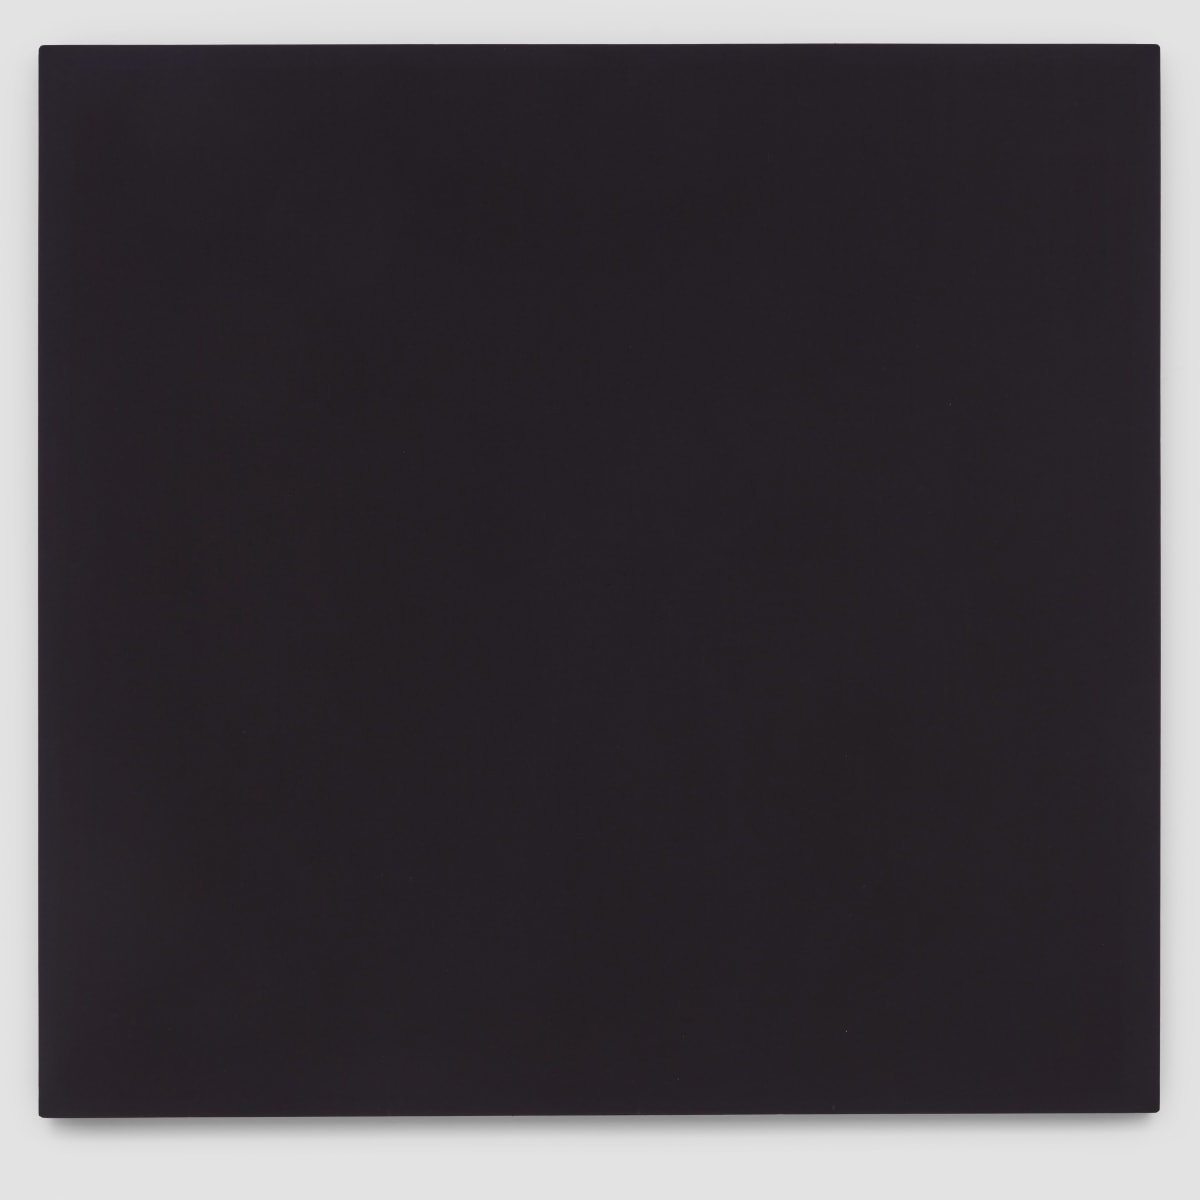 Art Basel OVR:20c